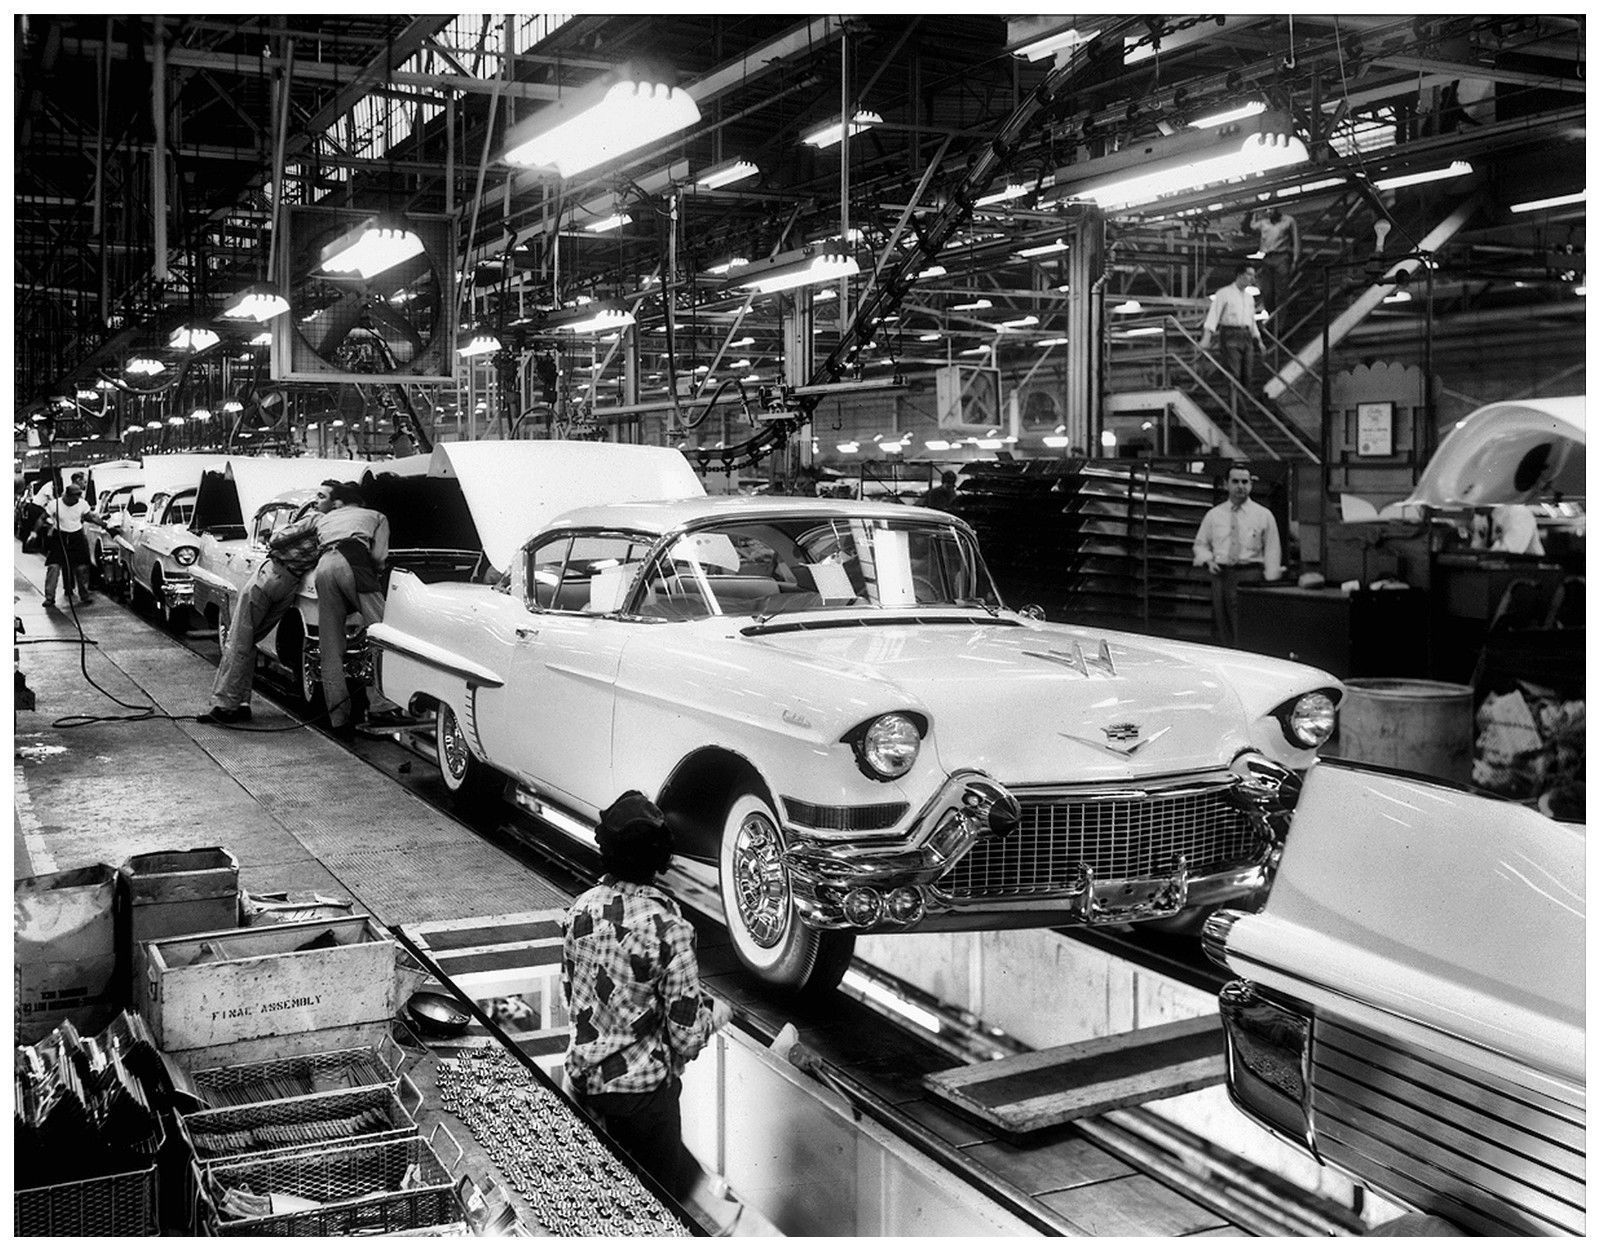 1957 Cadillac Assembly Line 8 x 10 Photograph | eBay ...